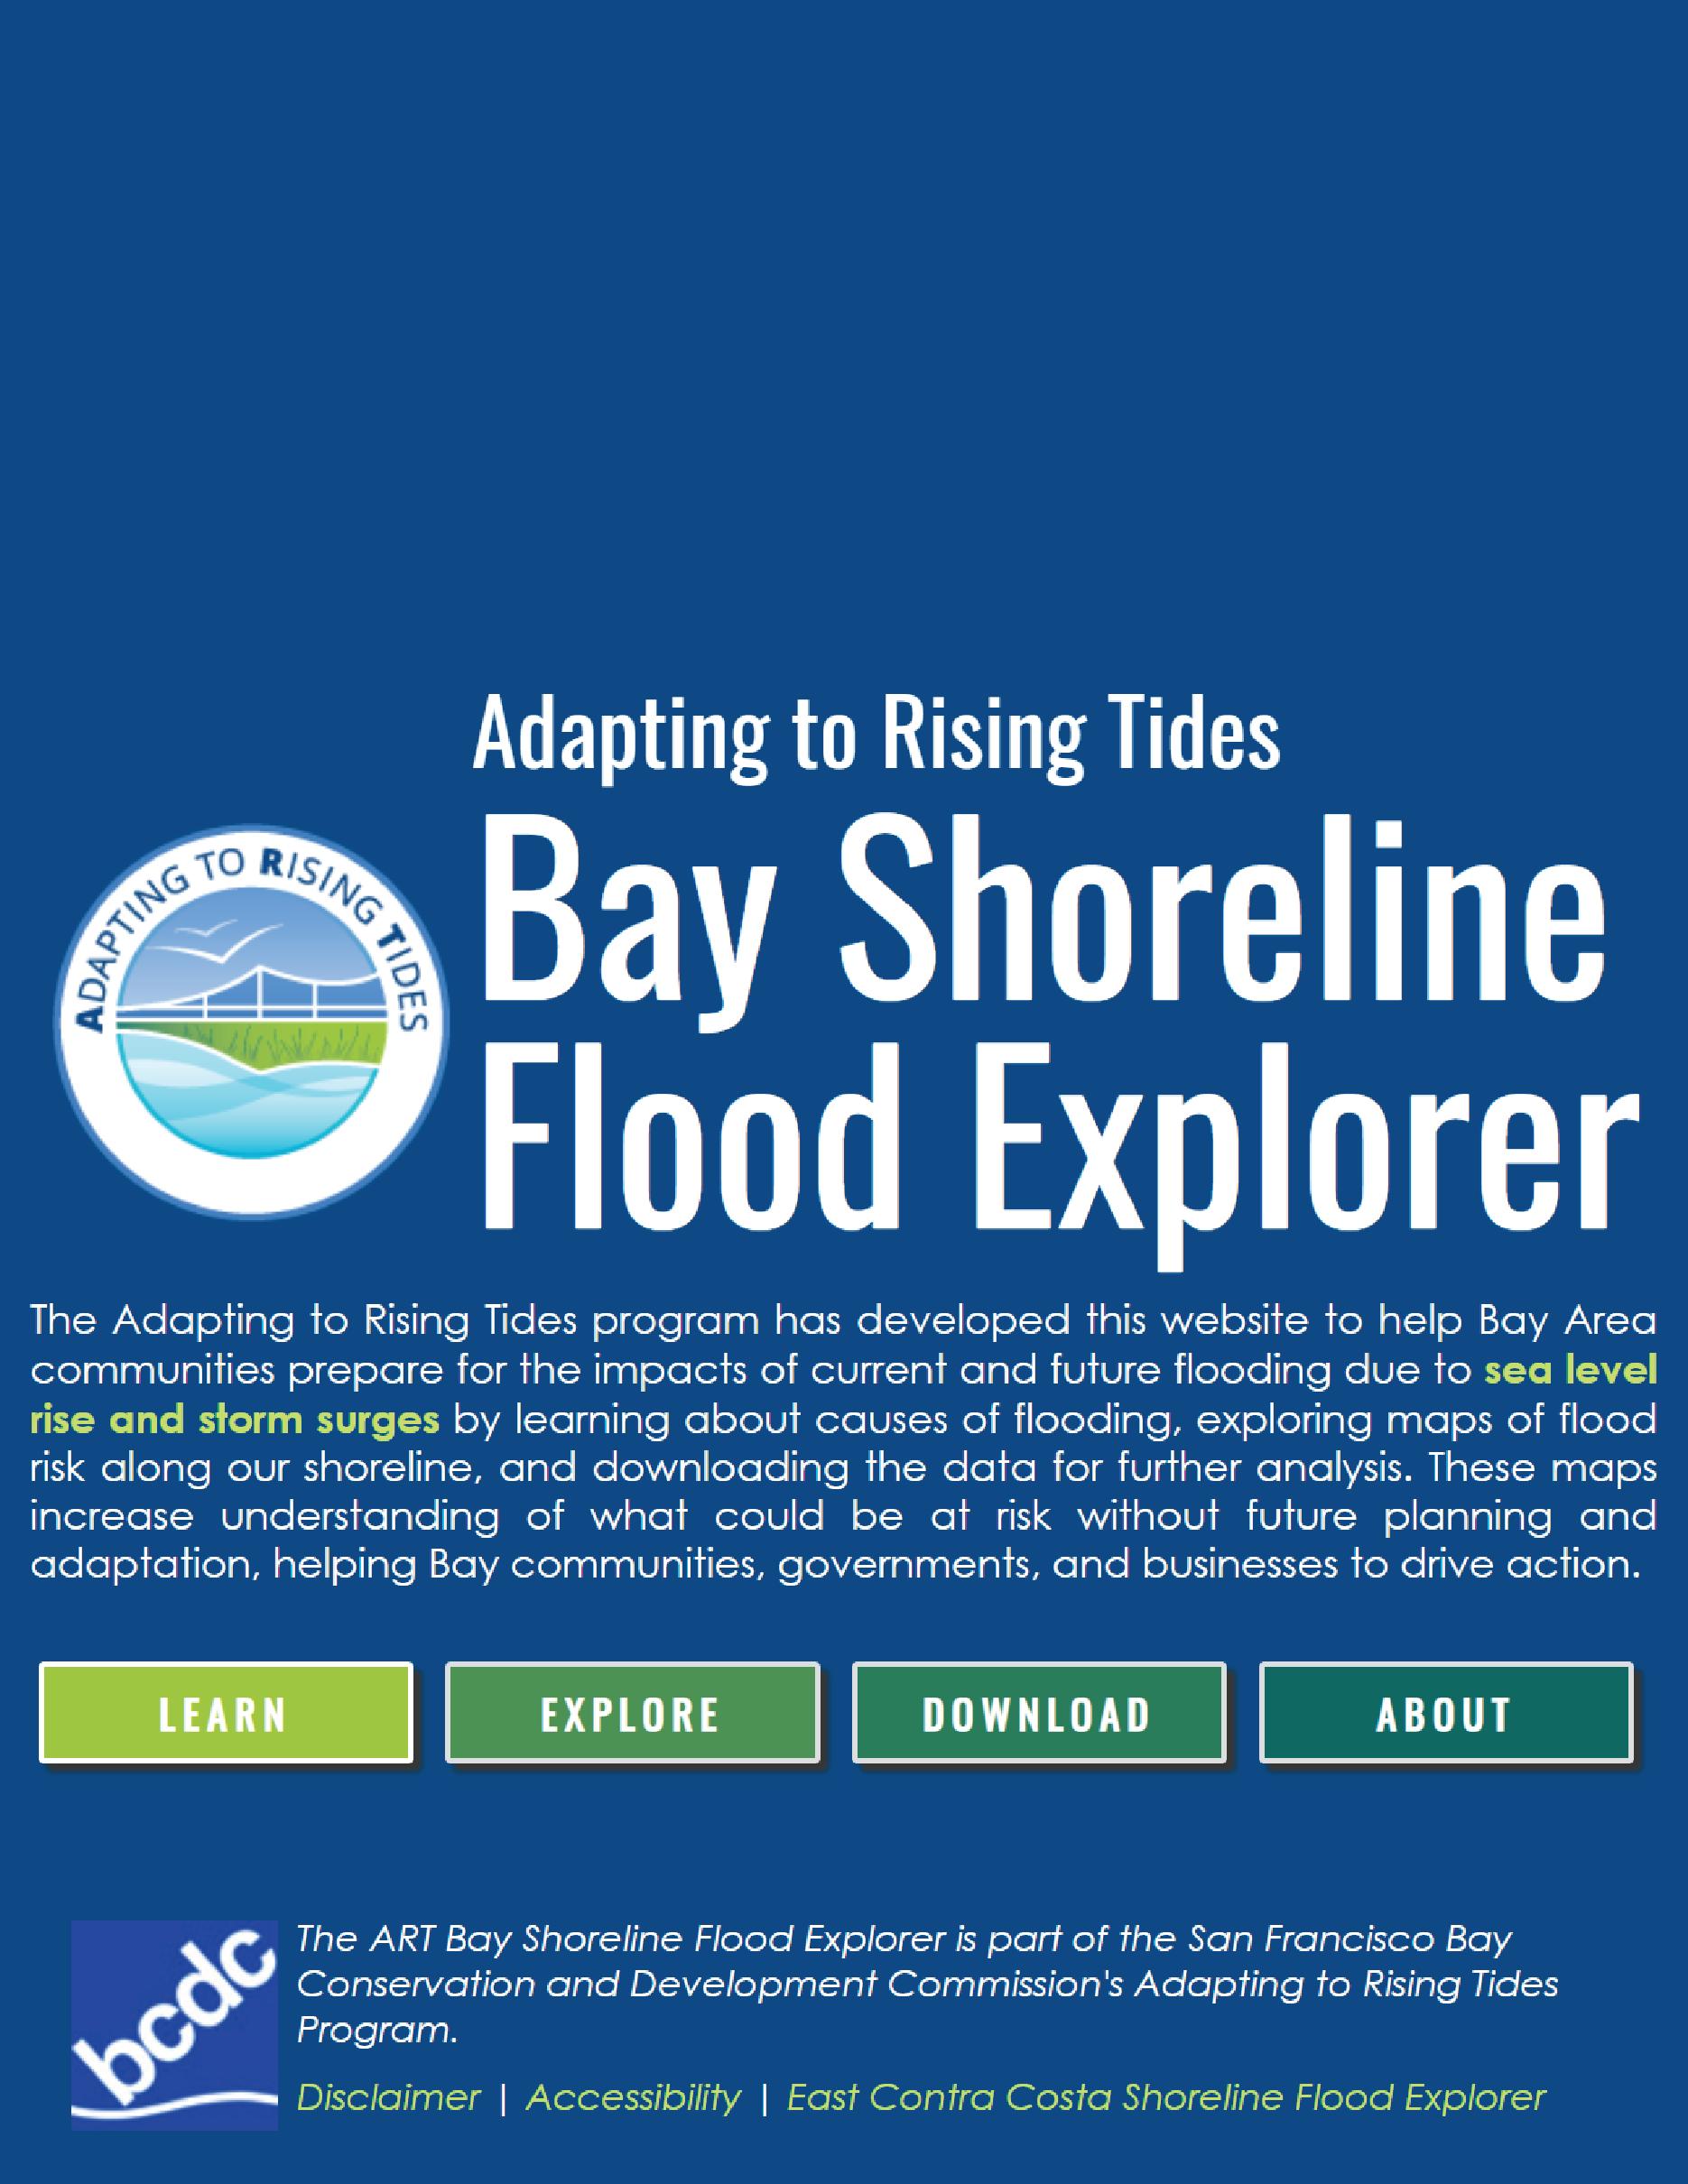 ART Bay Shoreline Flood Explorer